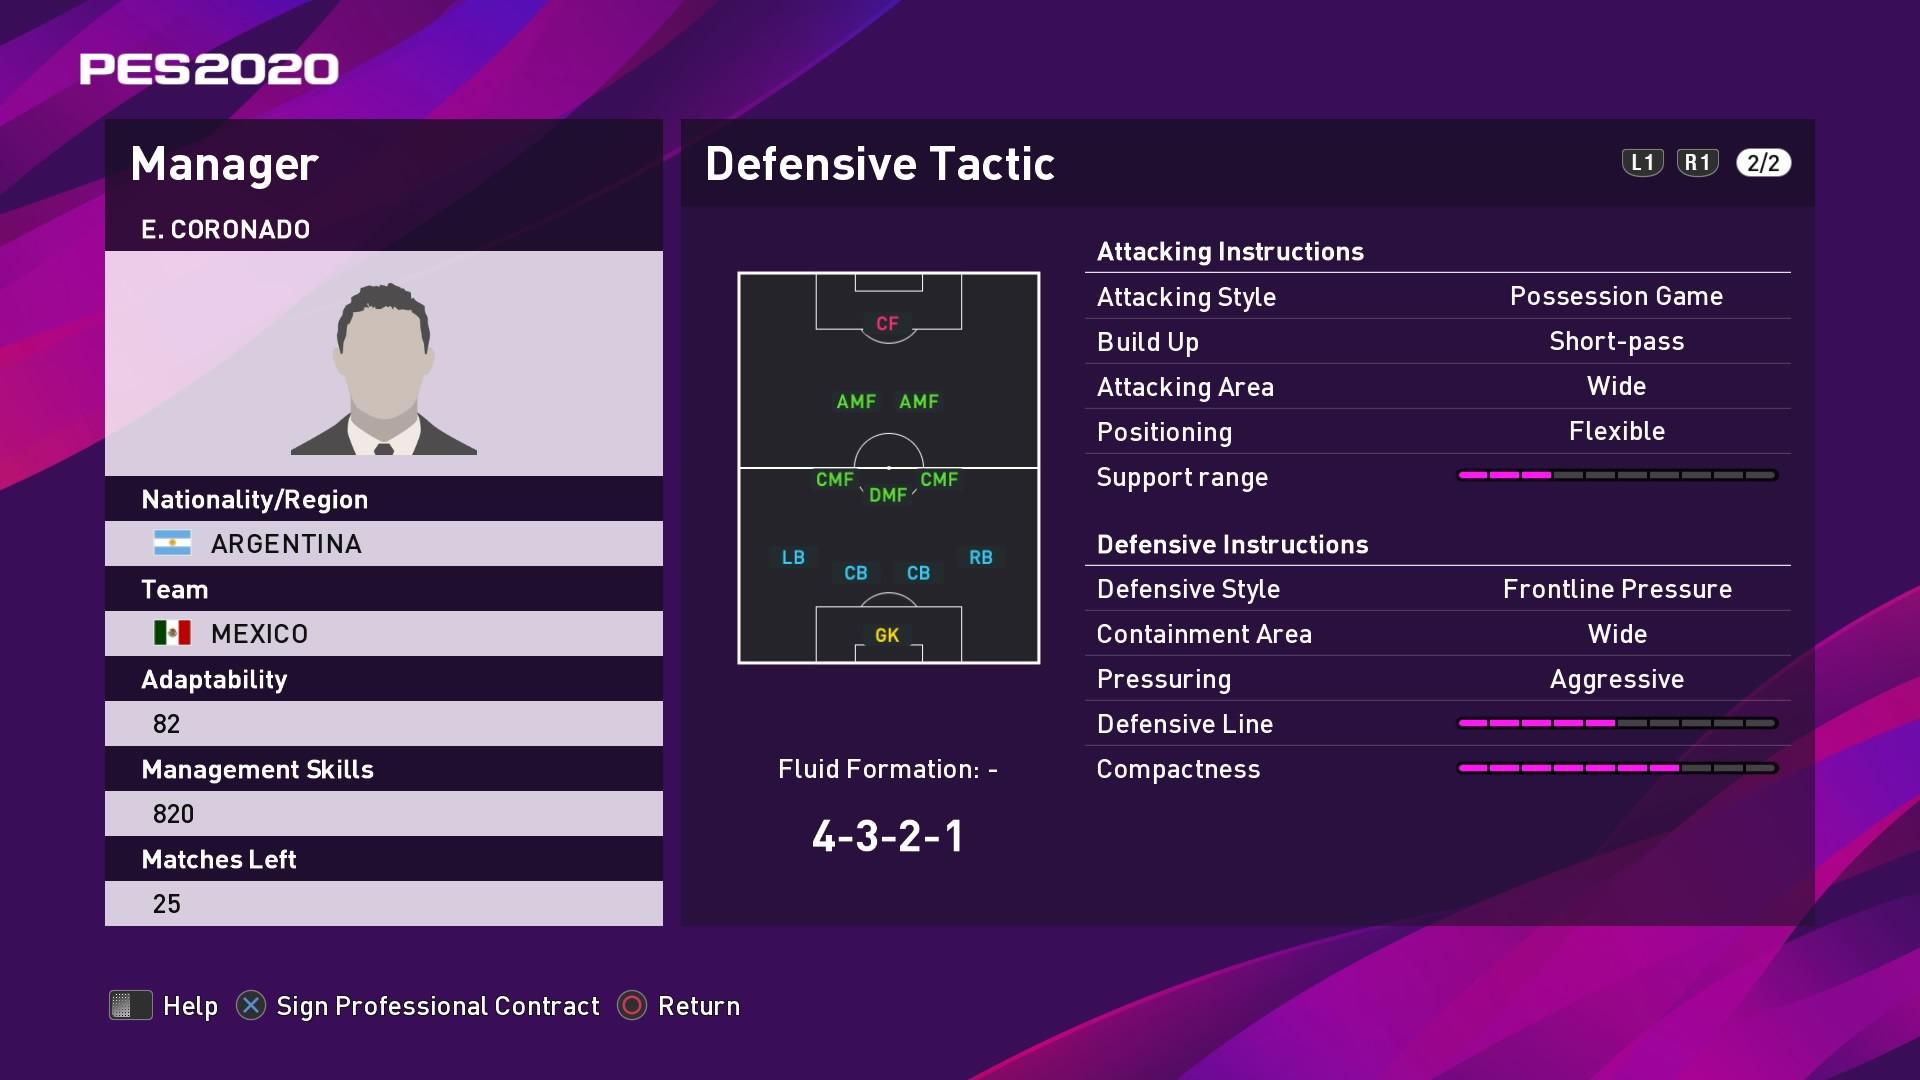 "E. Coronado (2) (Gerardo ""Tata"" Martino) Defensive Tactic in PES 2020 myClub"